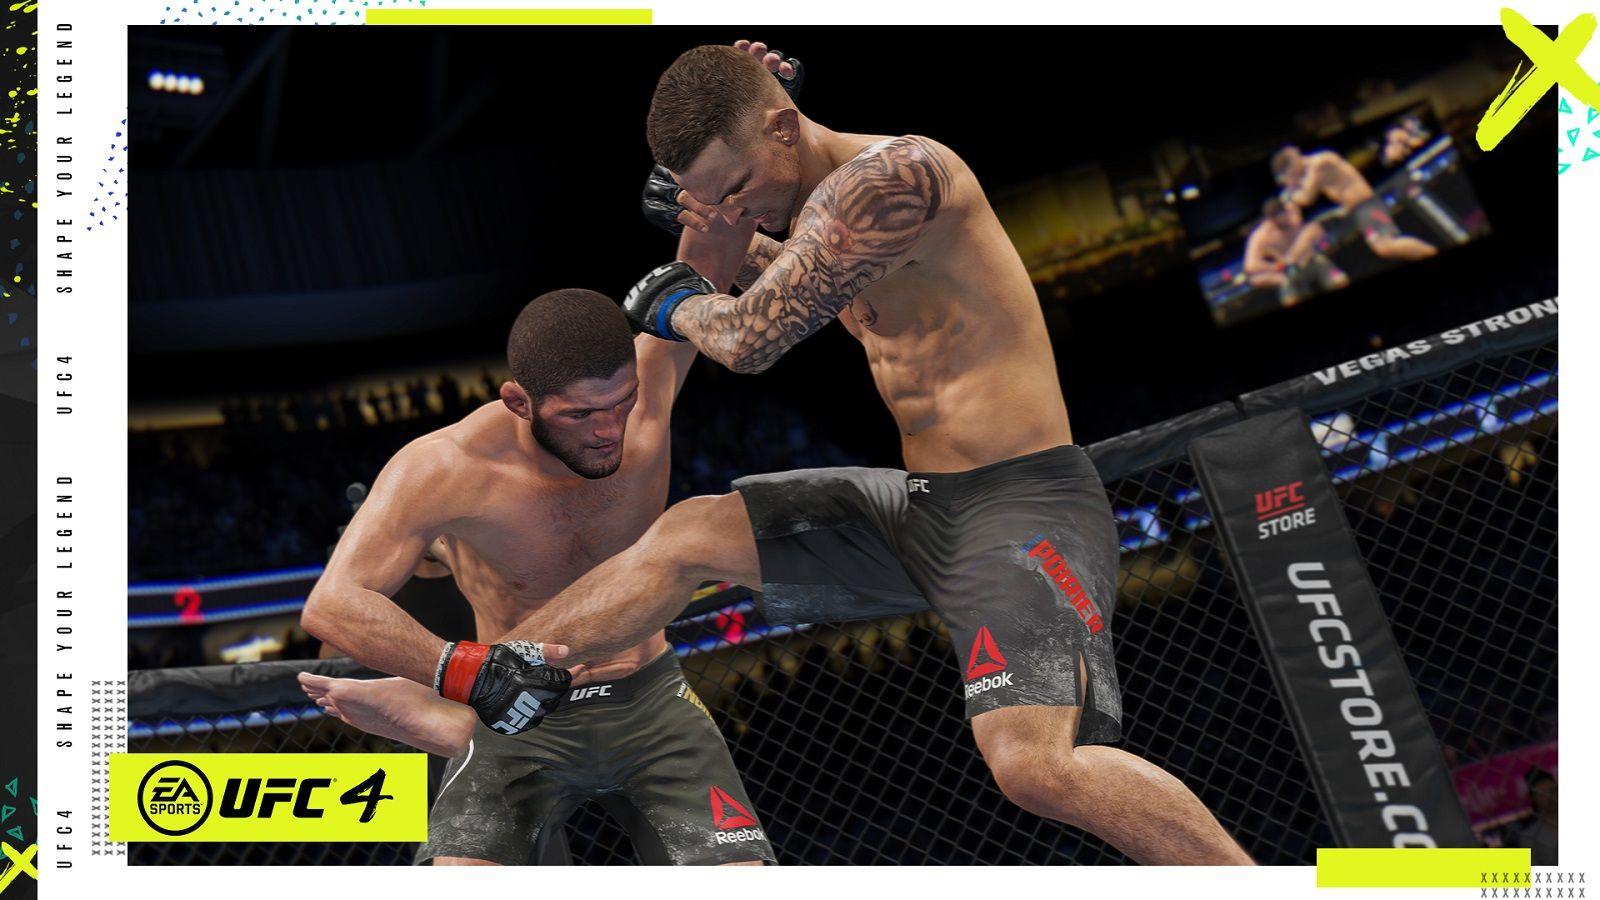 EA Sports UFC 4 Гайды, читы, секреты, коды, пасхалки.